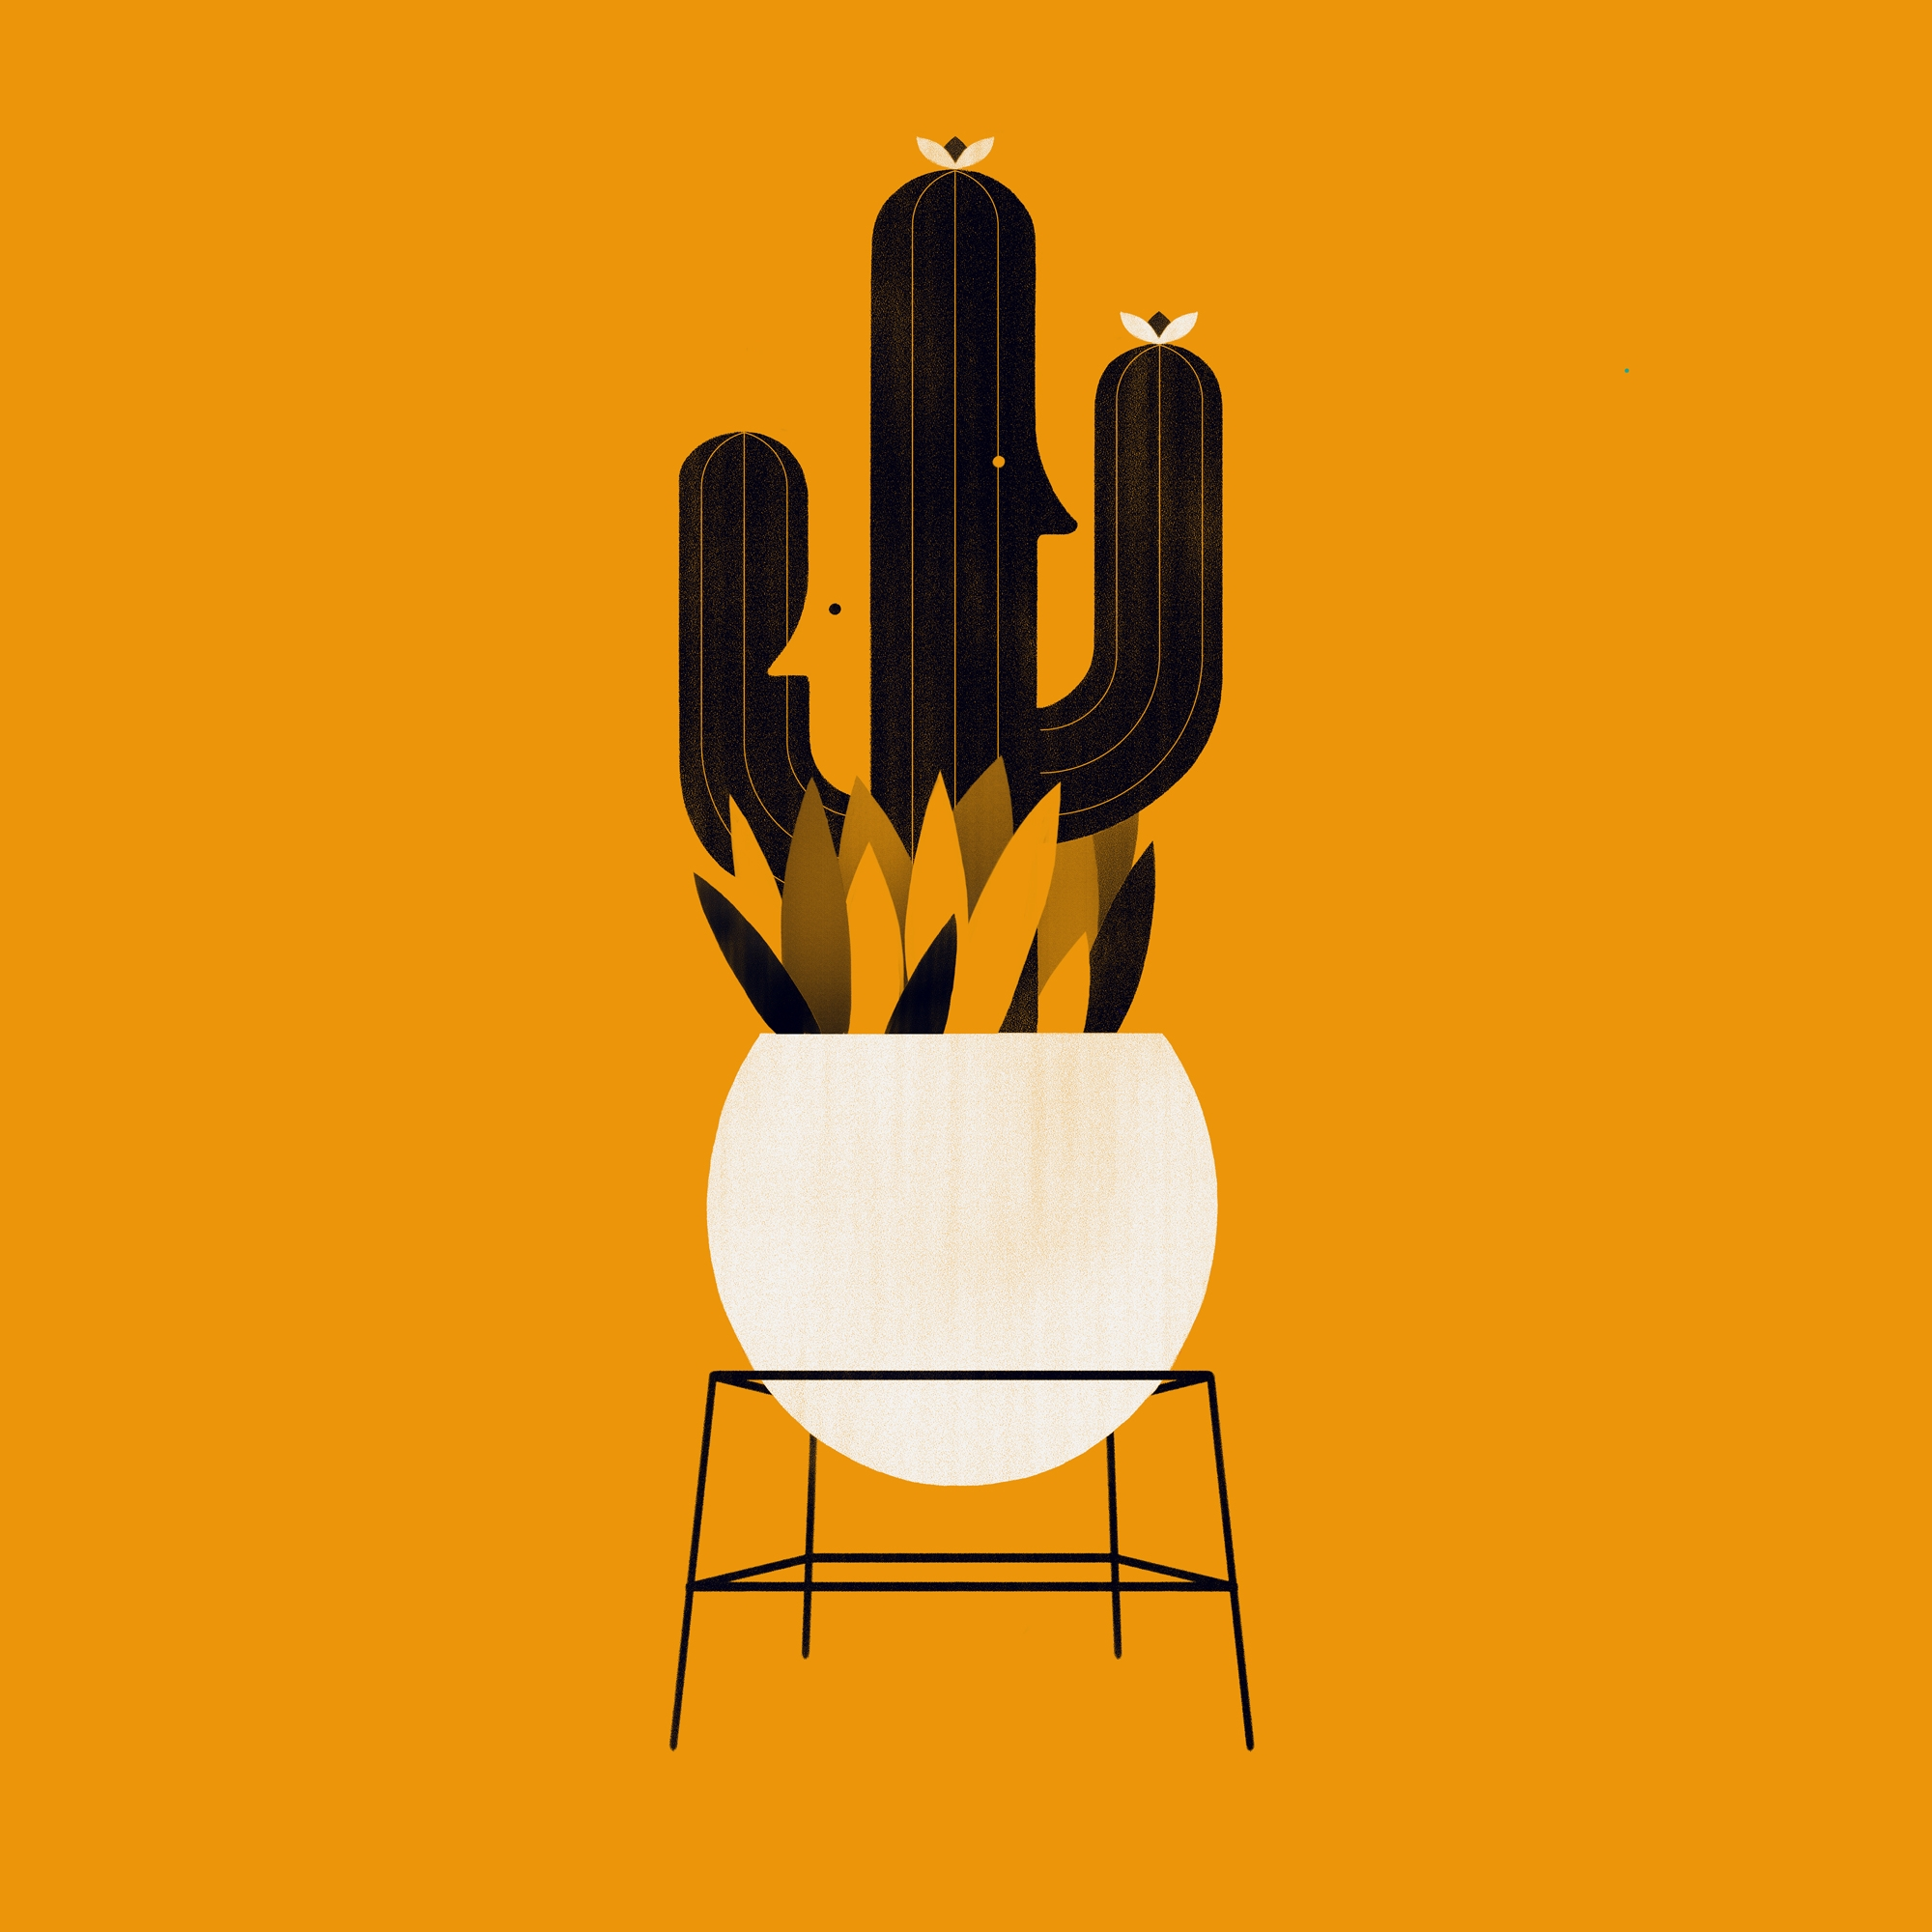 image, illustration, conceptual - giuliobonasera | ello